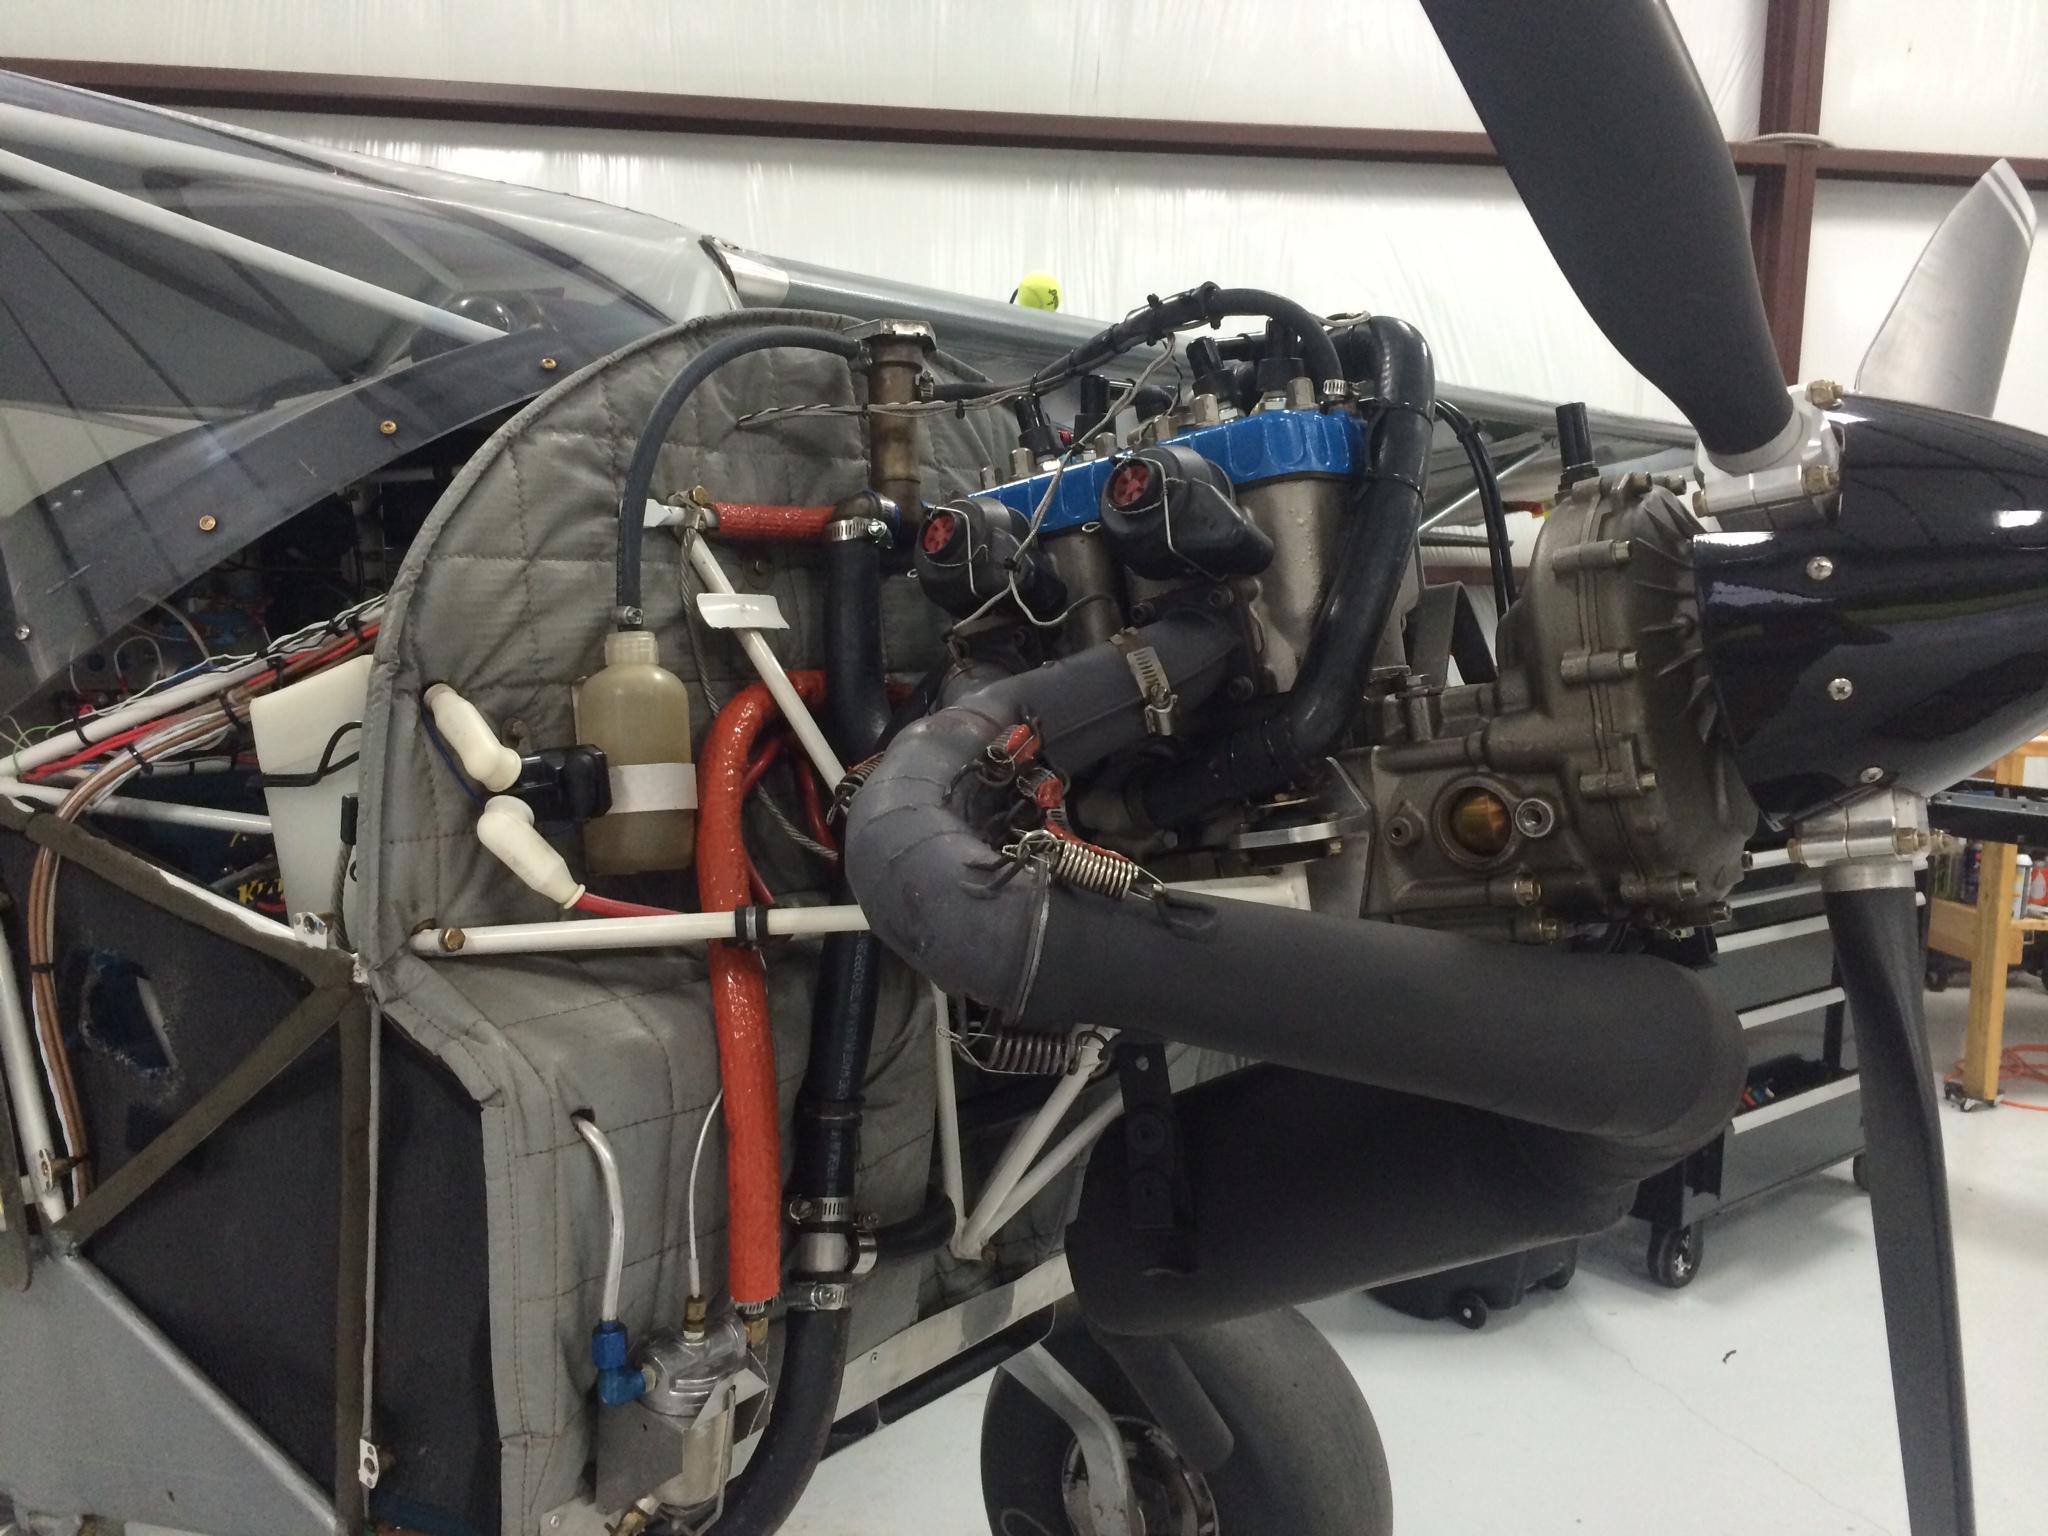 1999 kitfox IV engine change - Technical tasks